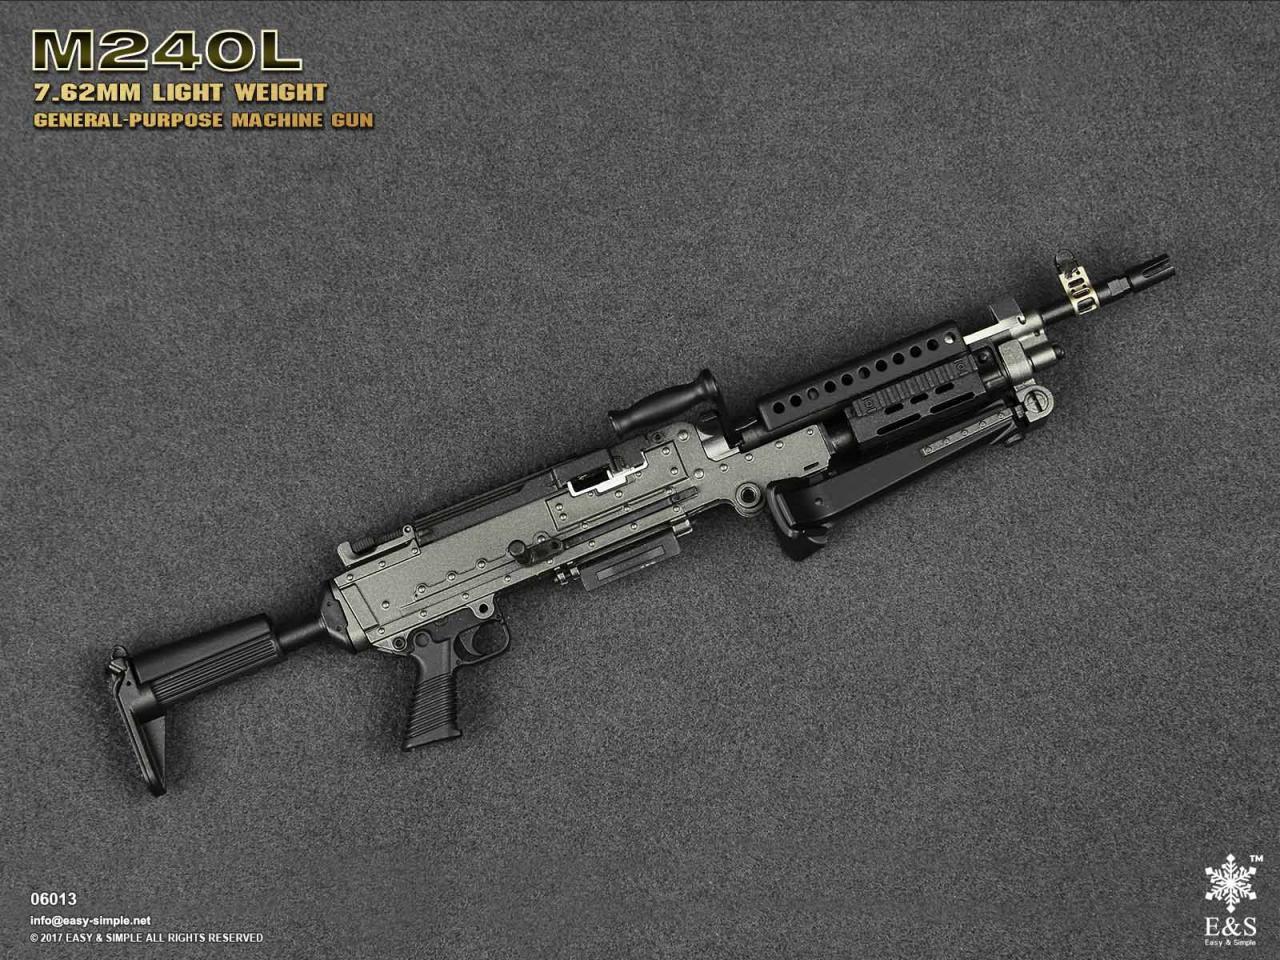 Easy&Simple 06013 M240L 7.62mm Light Weight General Purpose Machine Gun-06013-14-jpg